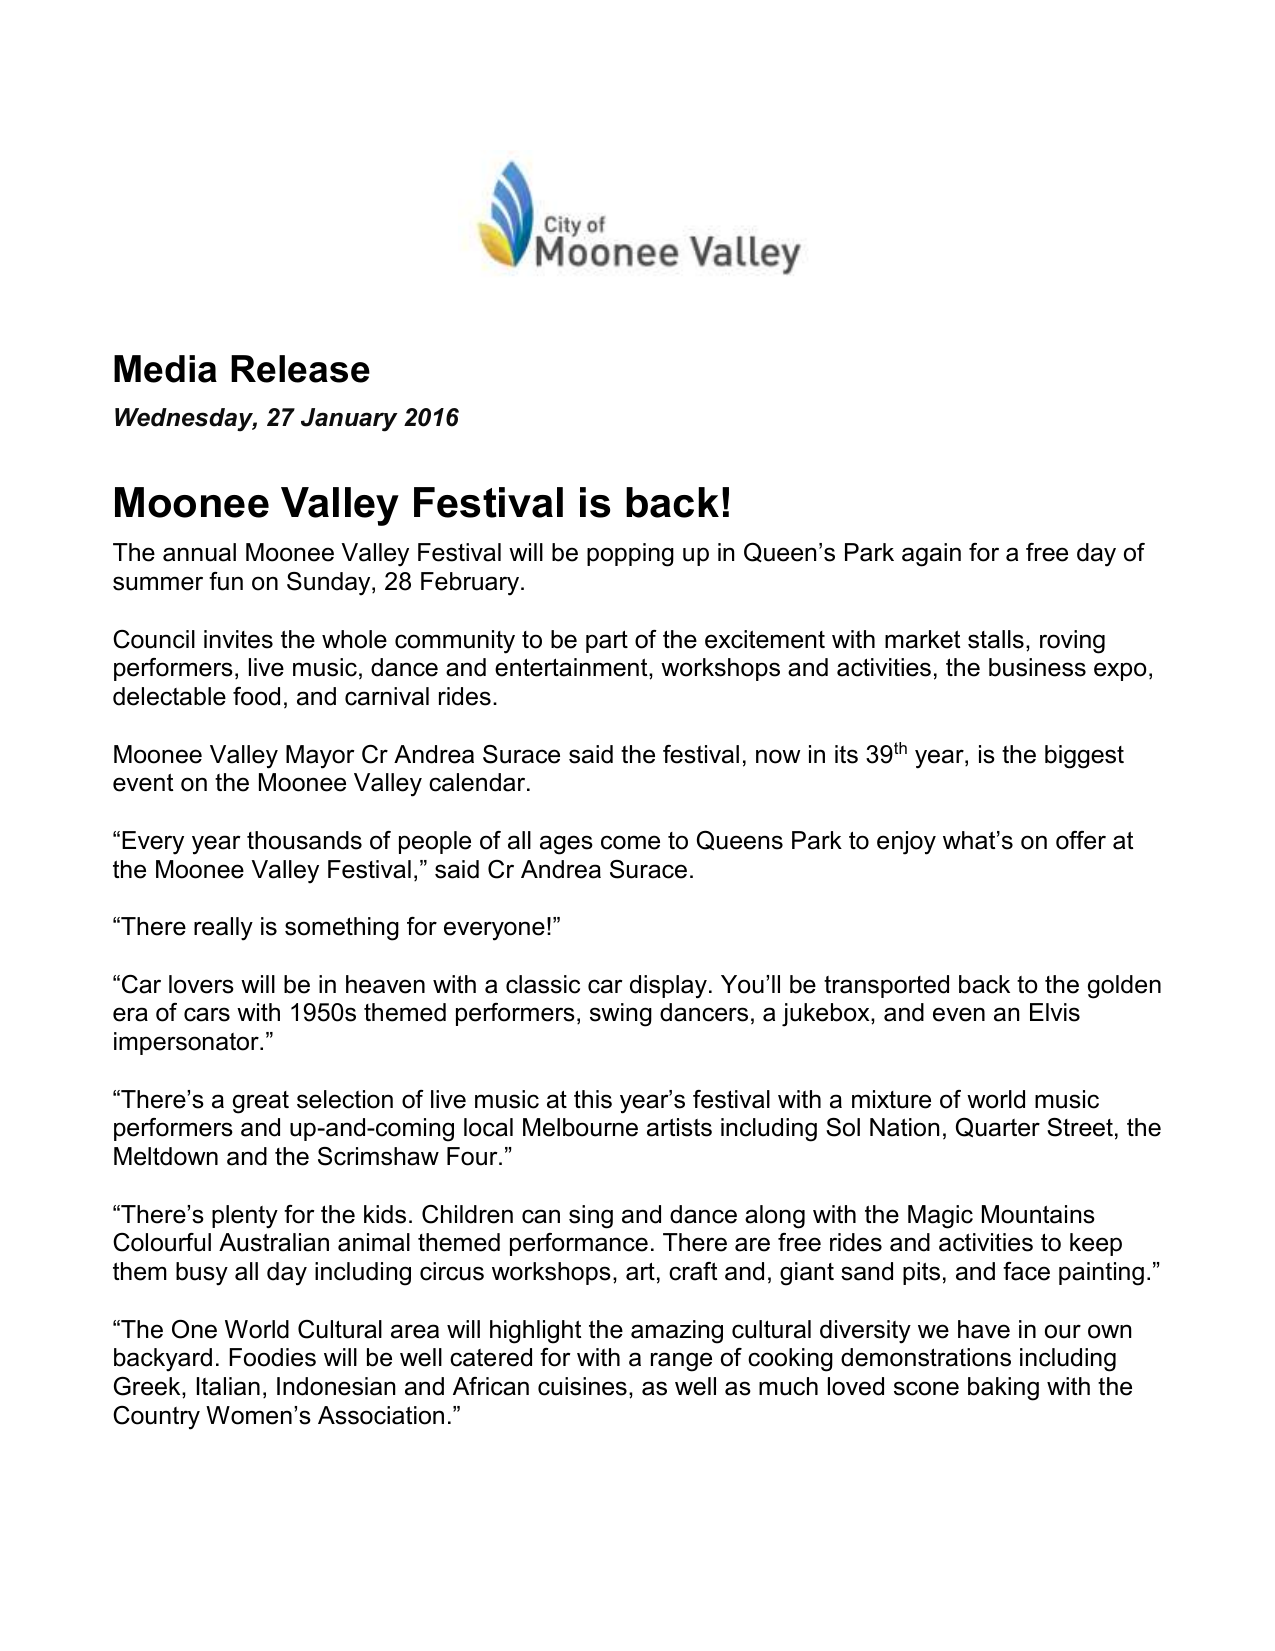 Media Release - City of Moonee Valley